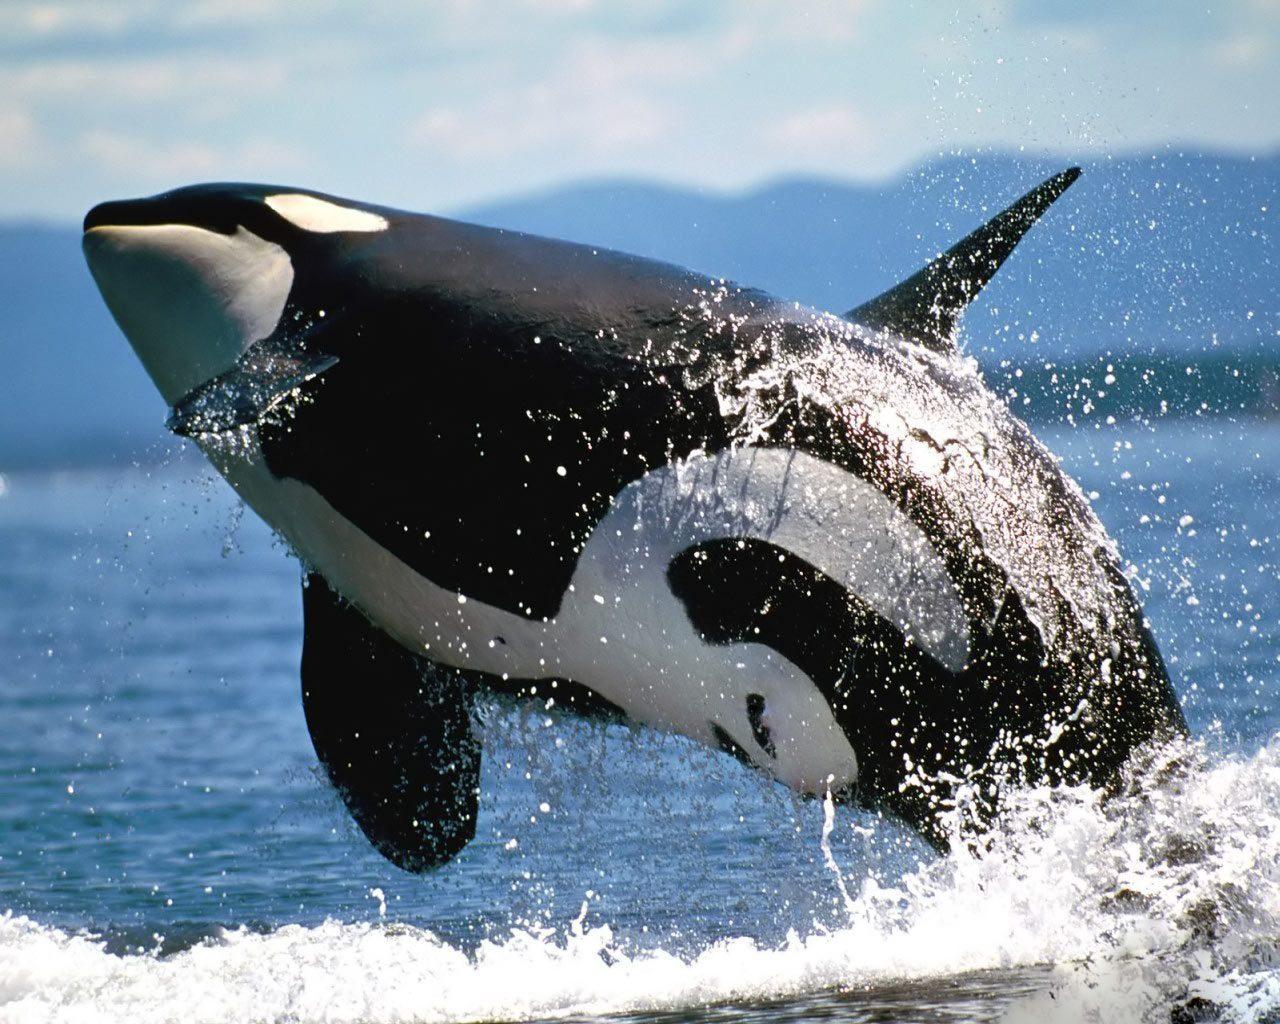 Fondos de pantalla de animales marinos for Ver fondos de escritorio